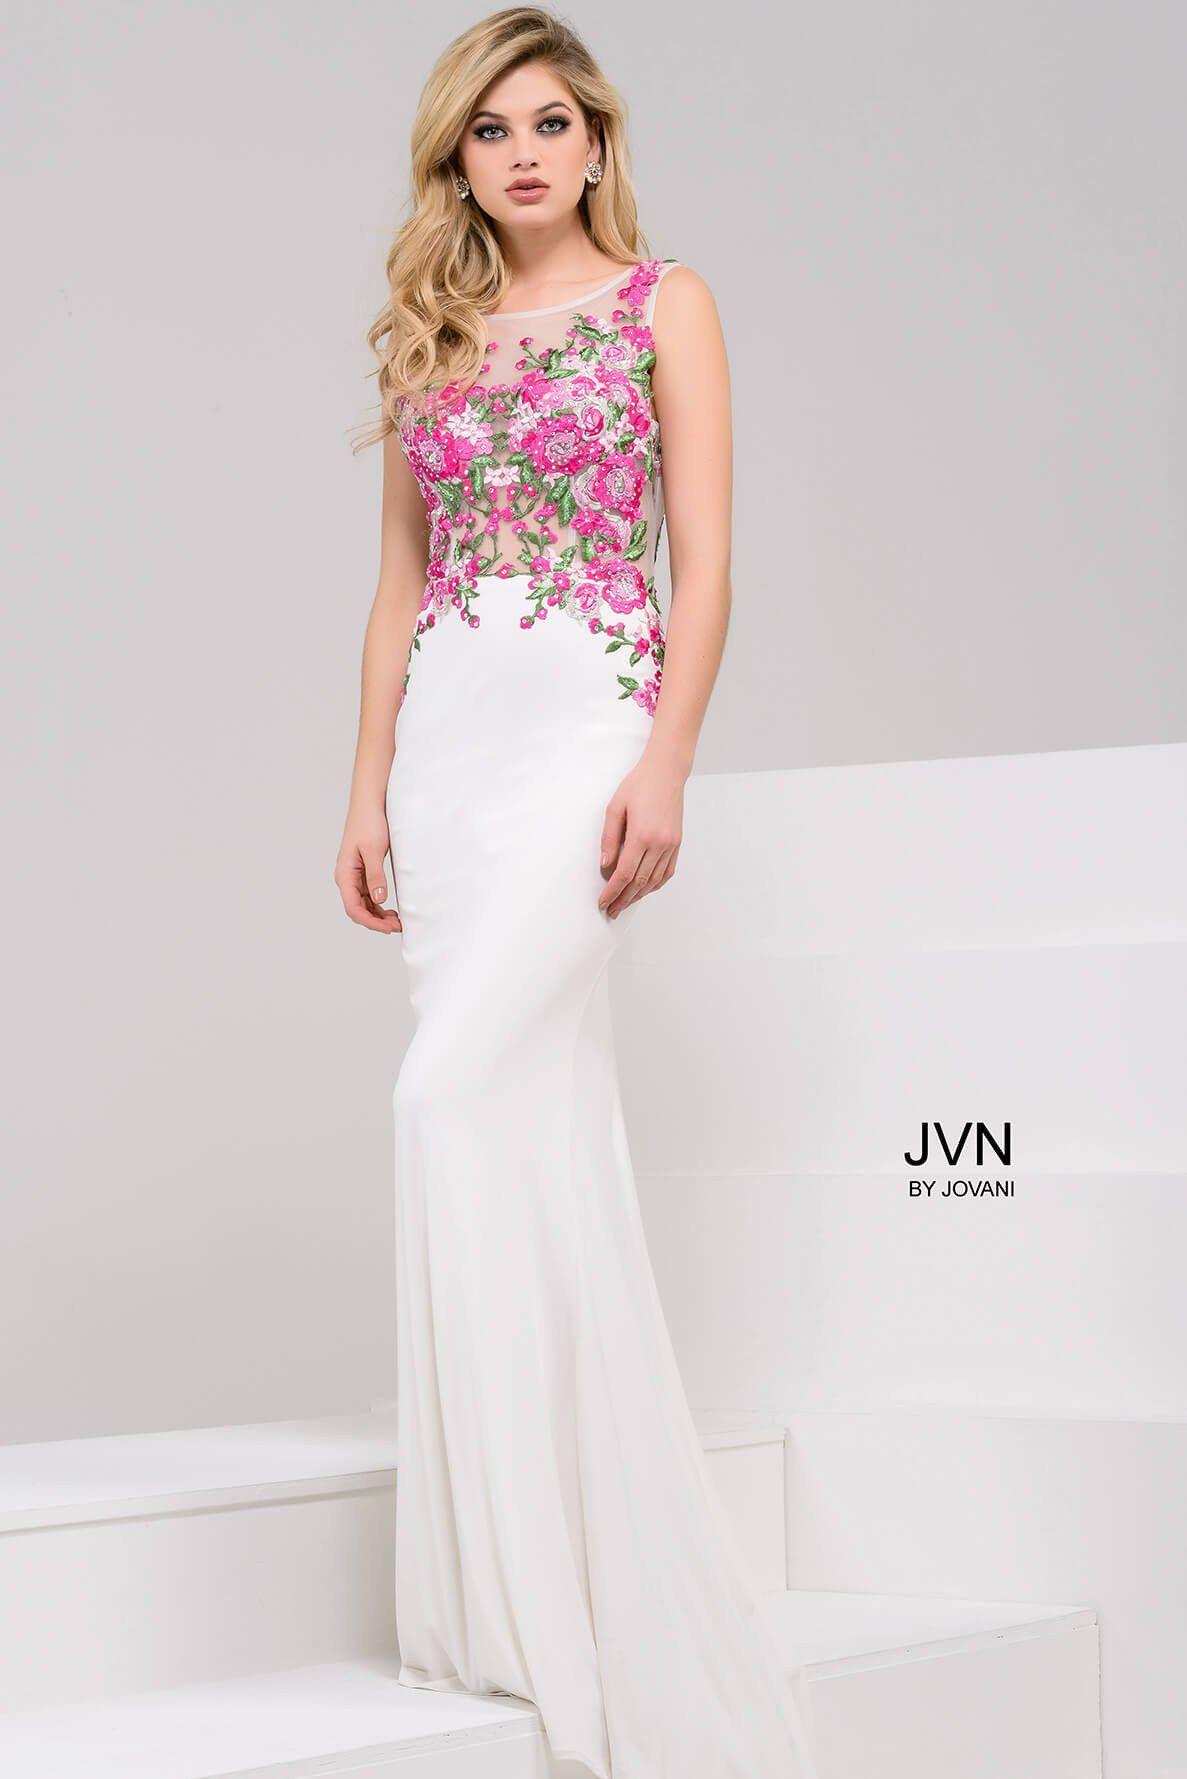 Photo of JVN by Jovani 50045 Floral Applique Open Back Dress